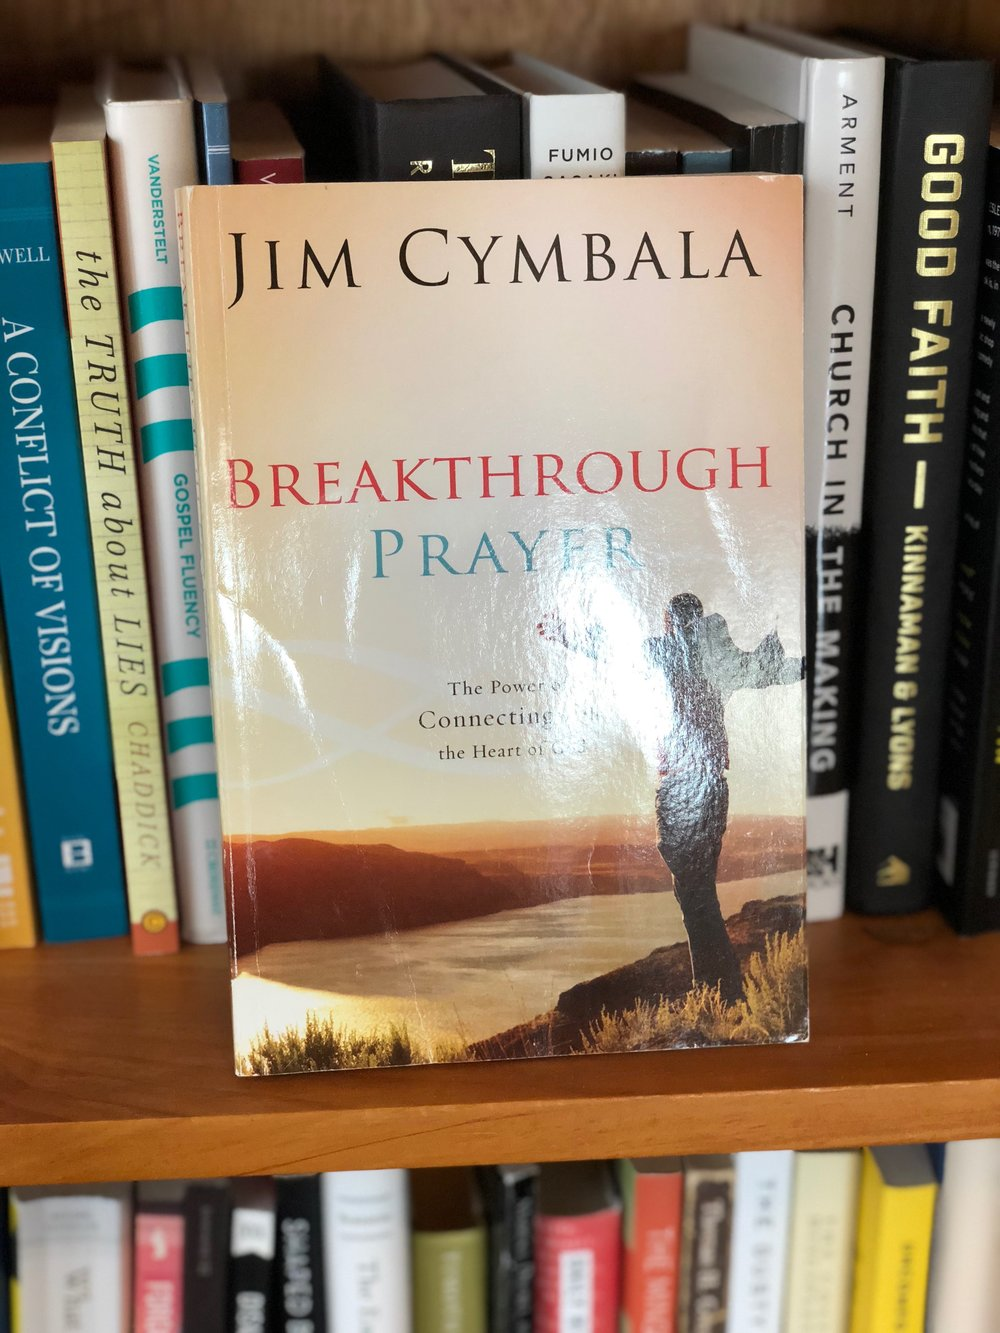 Breakthrough Prayer - Jim Cymbala